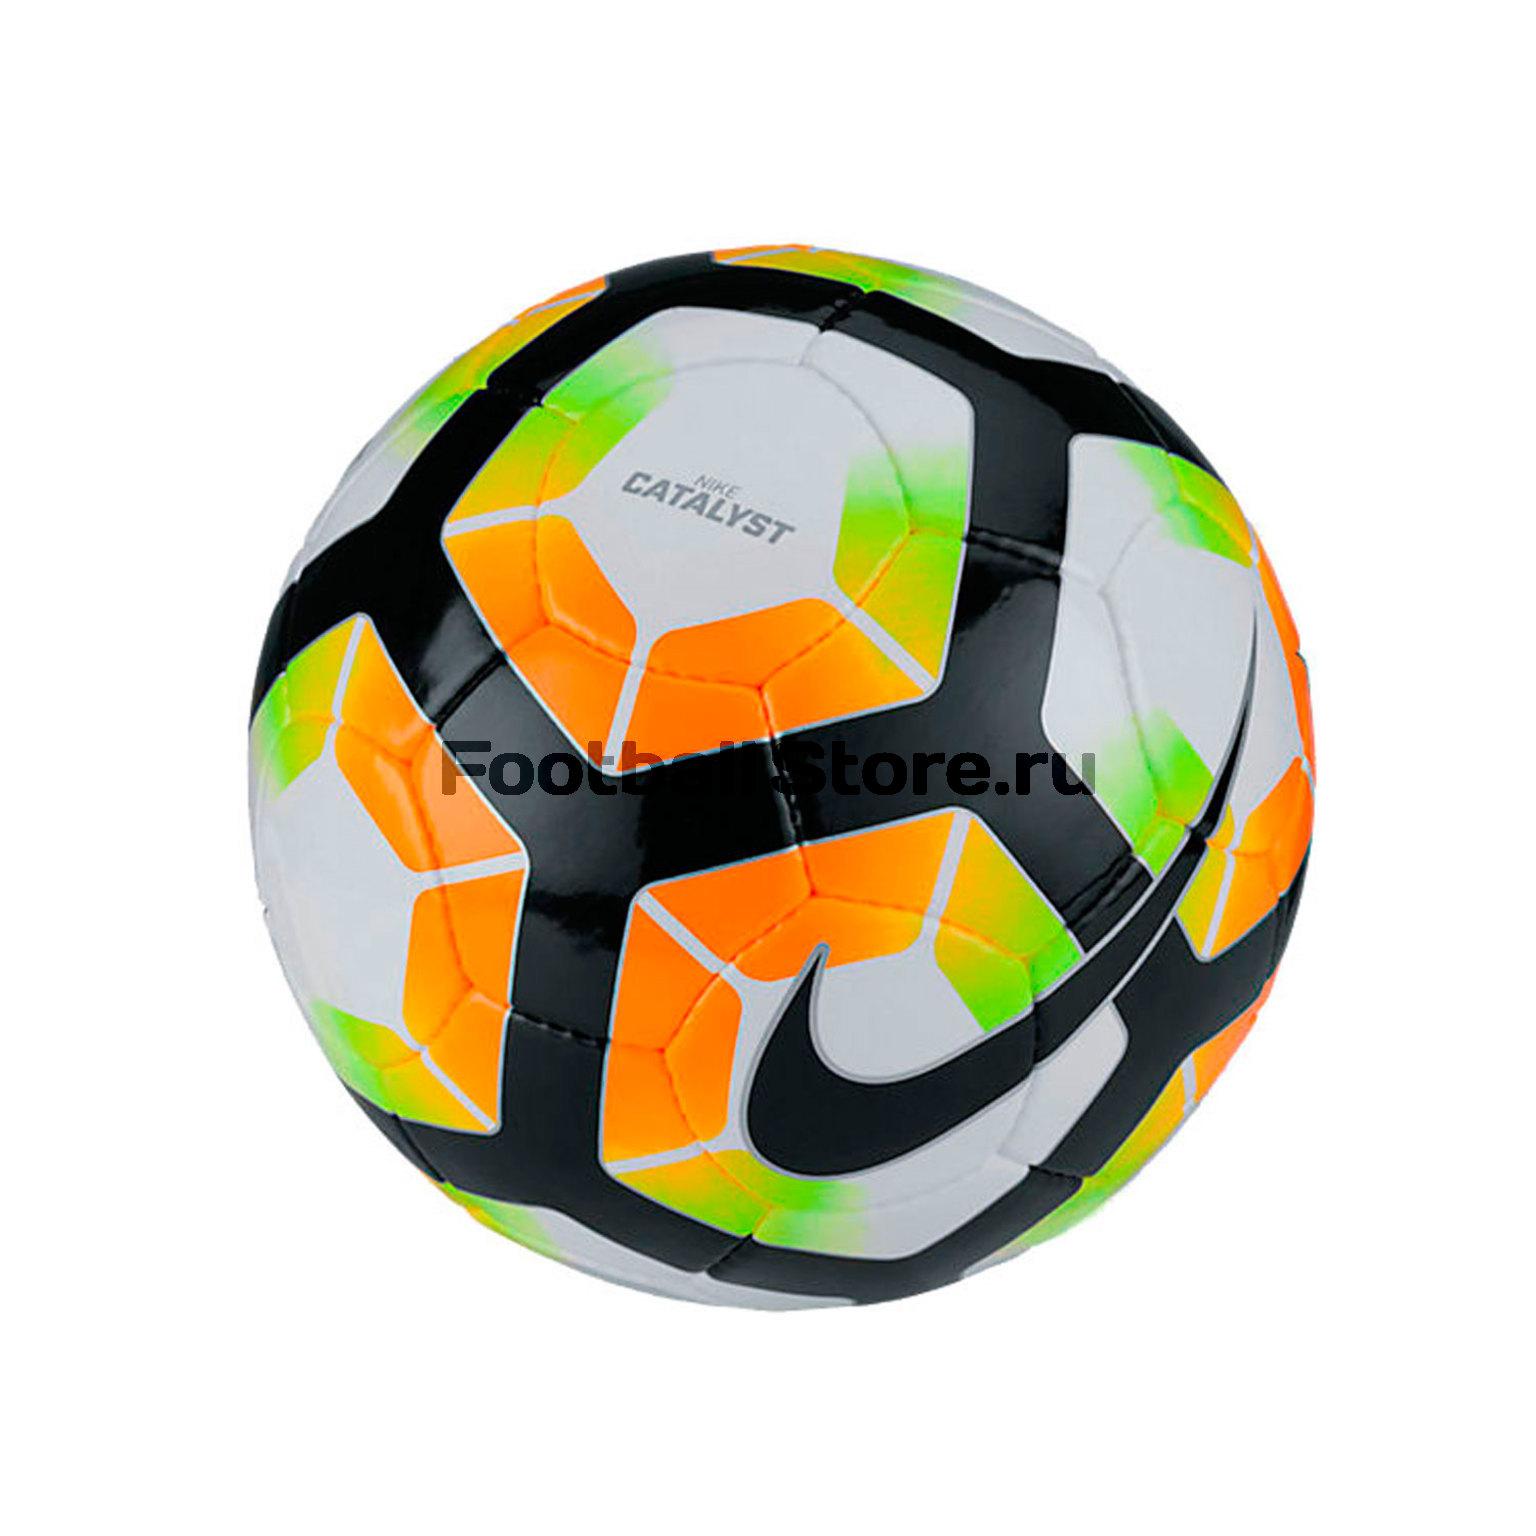 Классические Nike Мяч Nike Catalyst SC2968-100